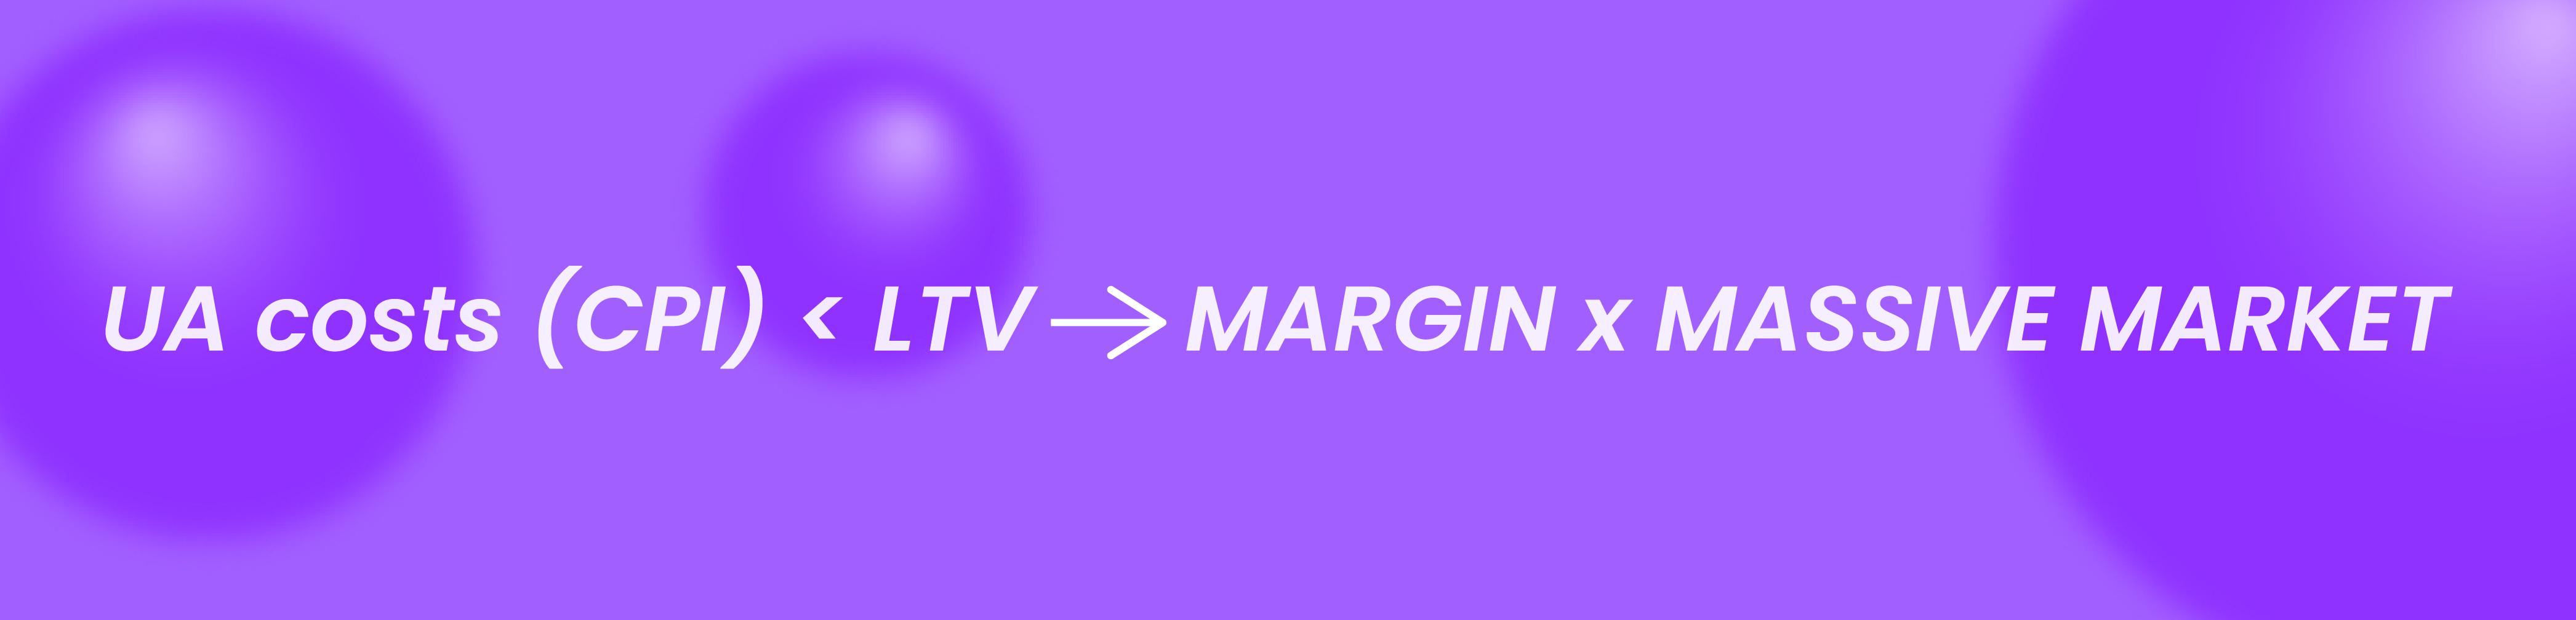 UA costs (CPI) < LTV → margin x massive market